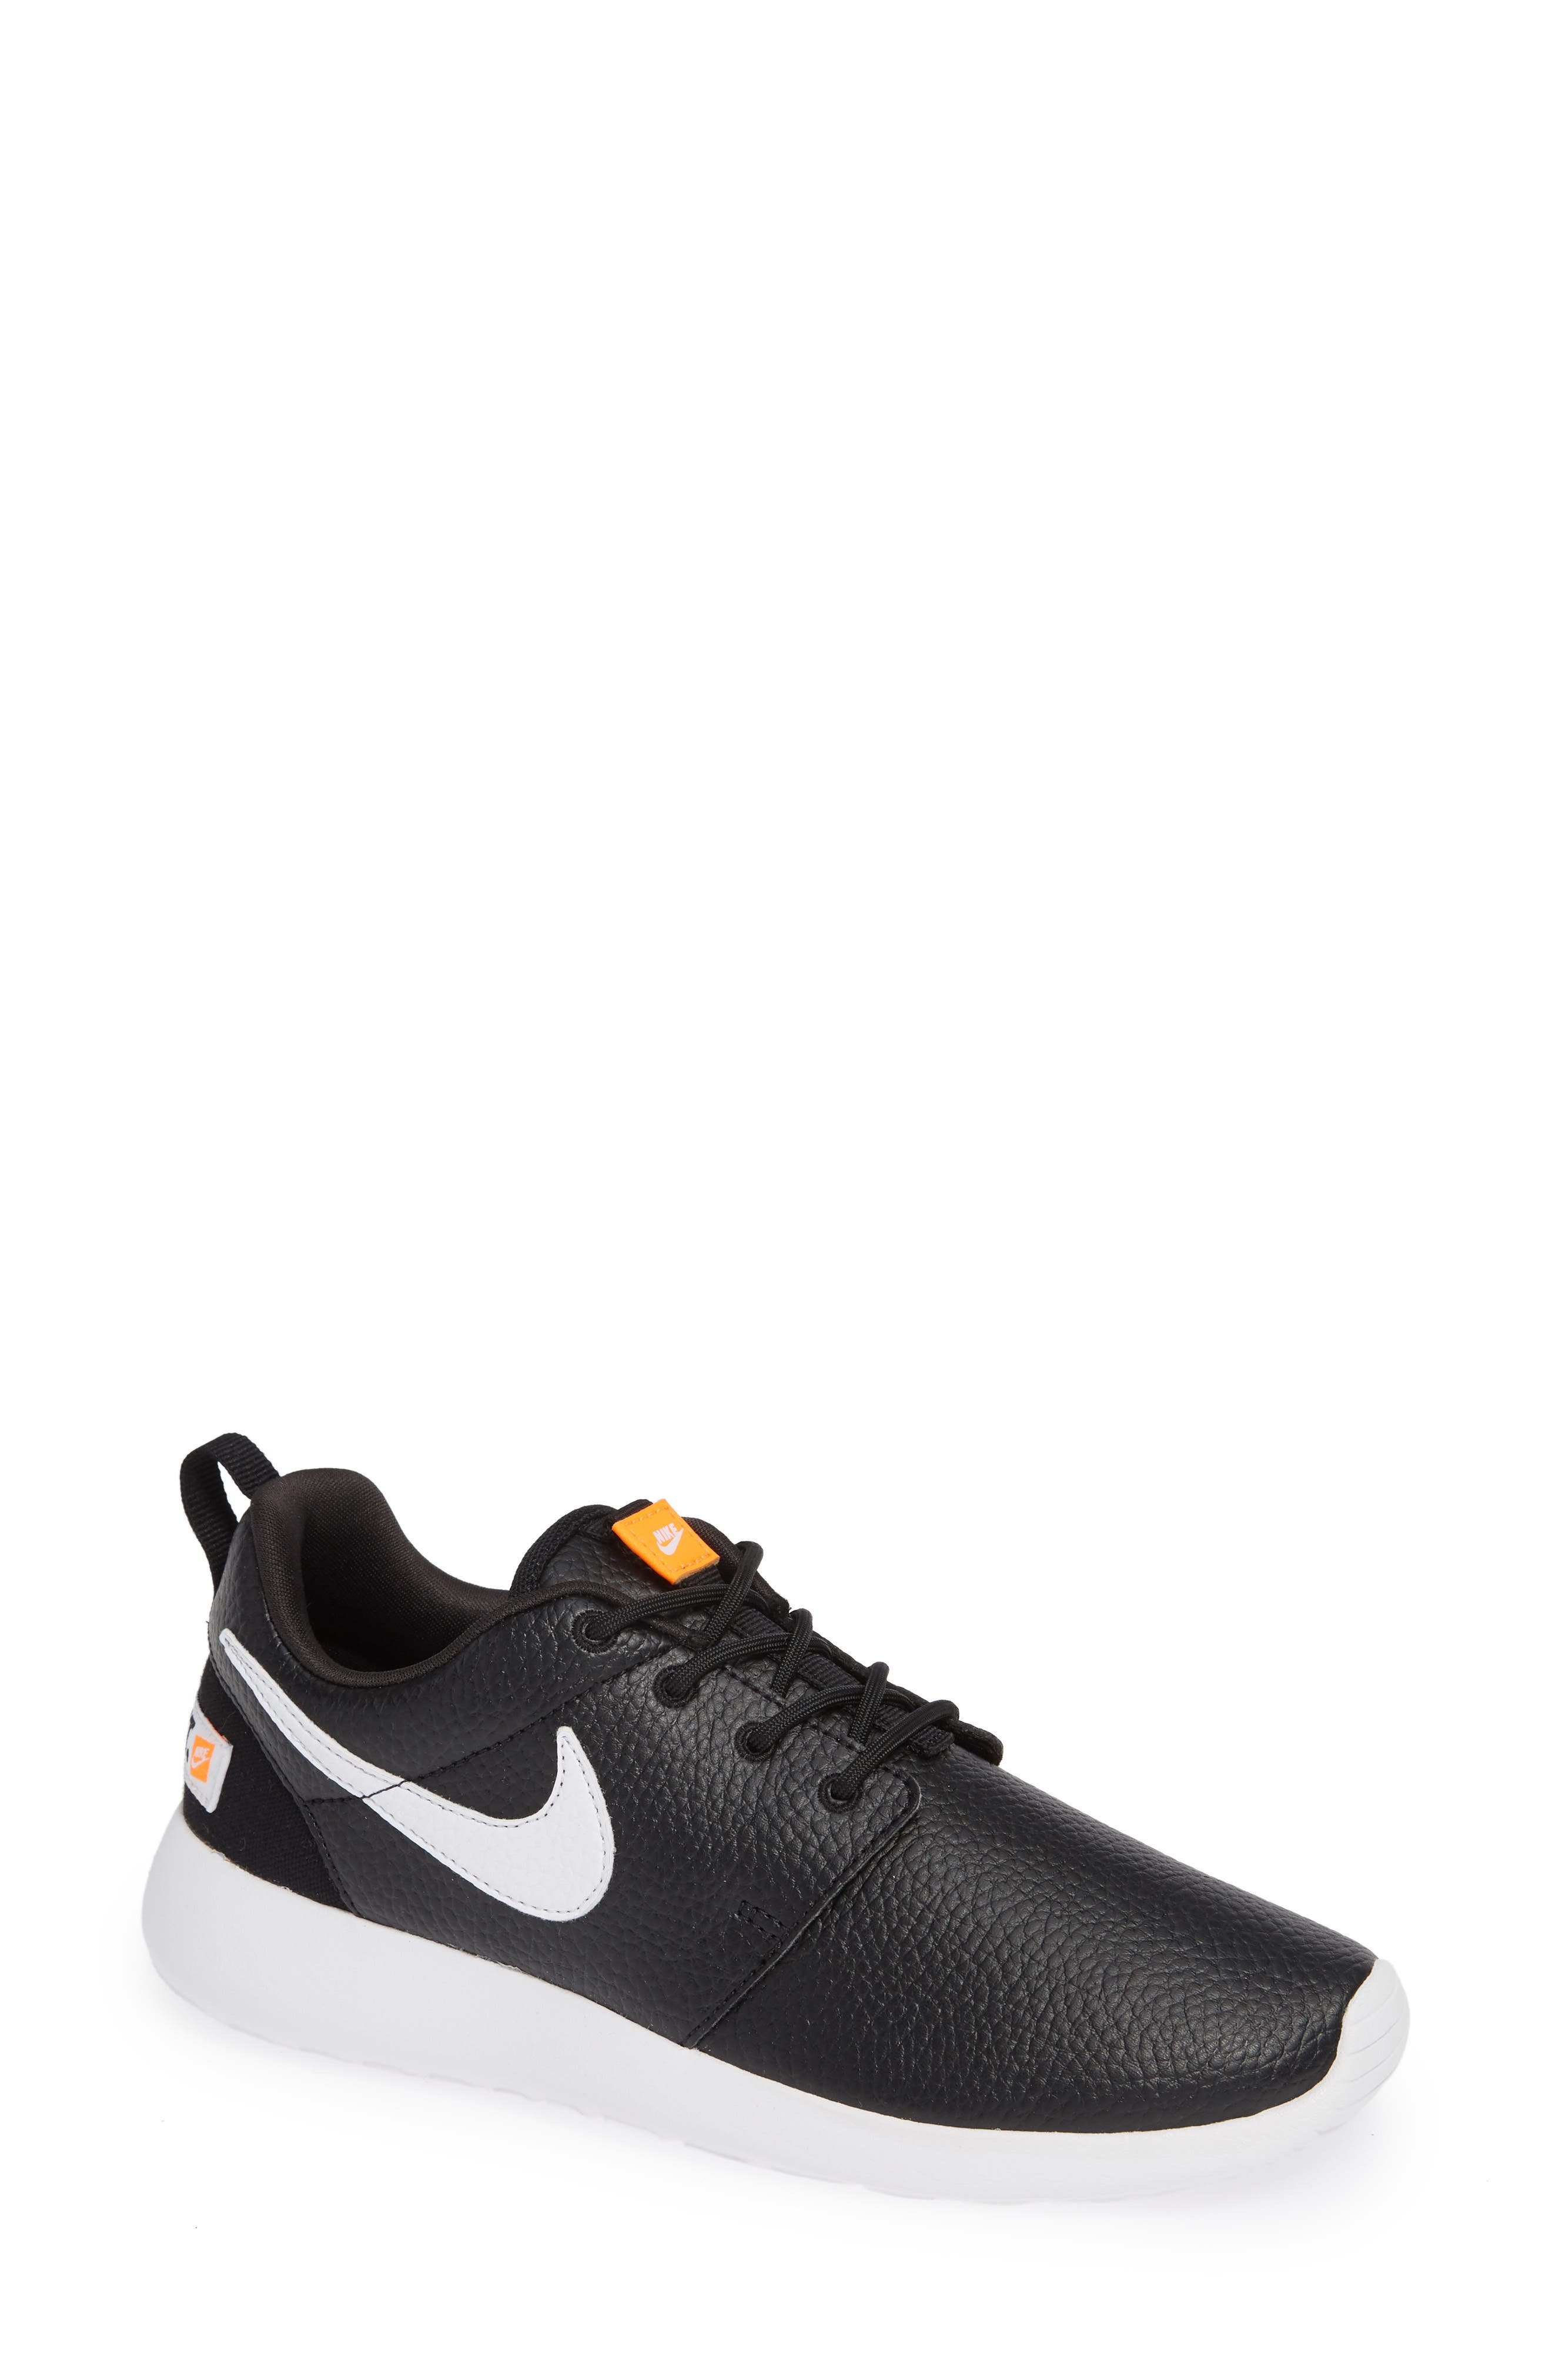 'Roshe Run' Print Sneaker,                         Main,                         color, Black/ White/ Total Orange